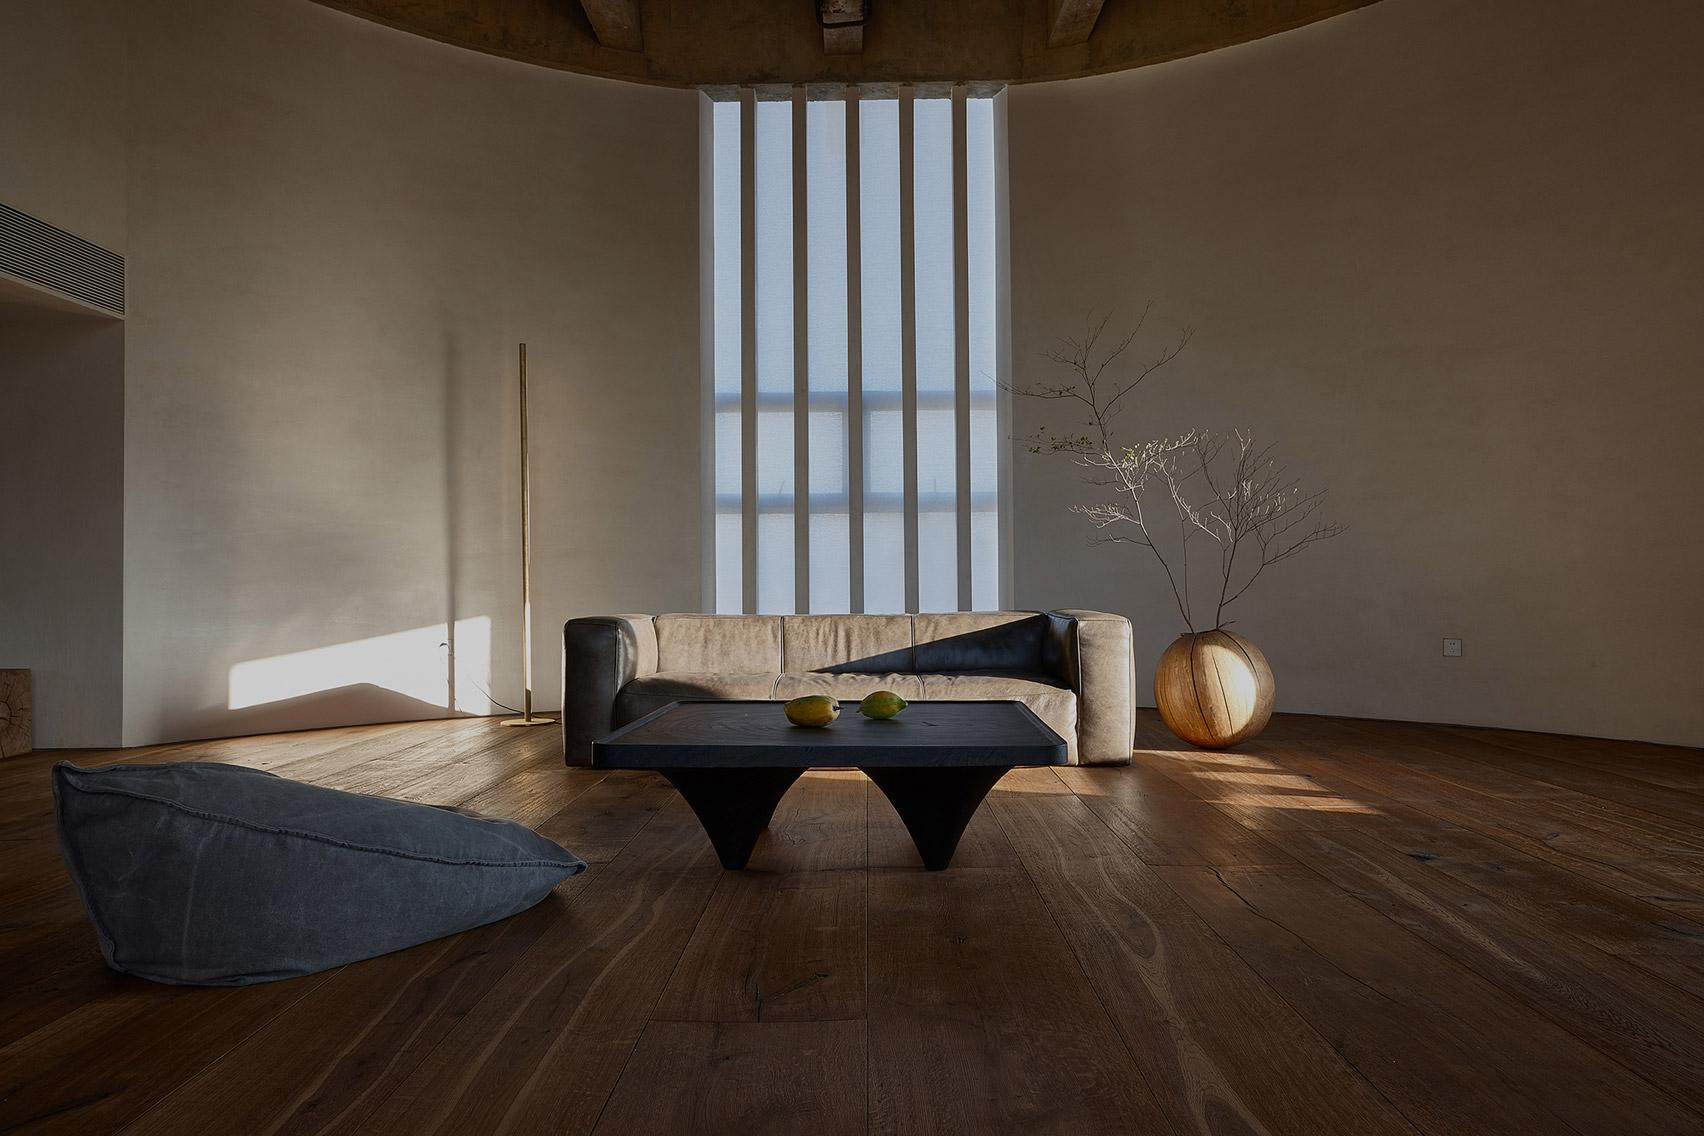 Sofa in cavernous living room.